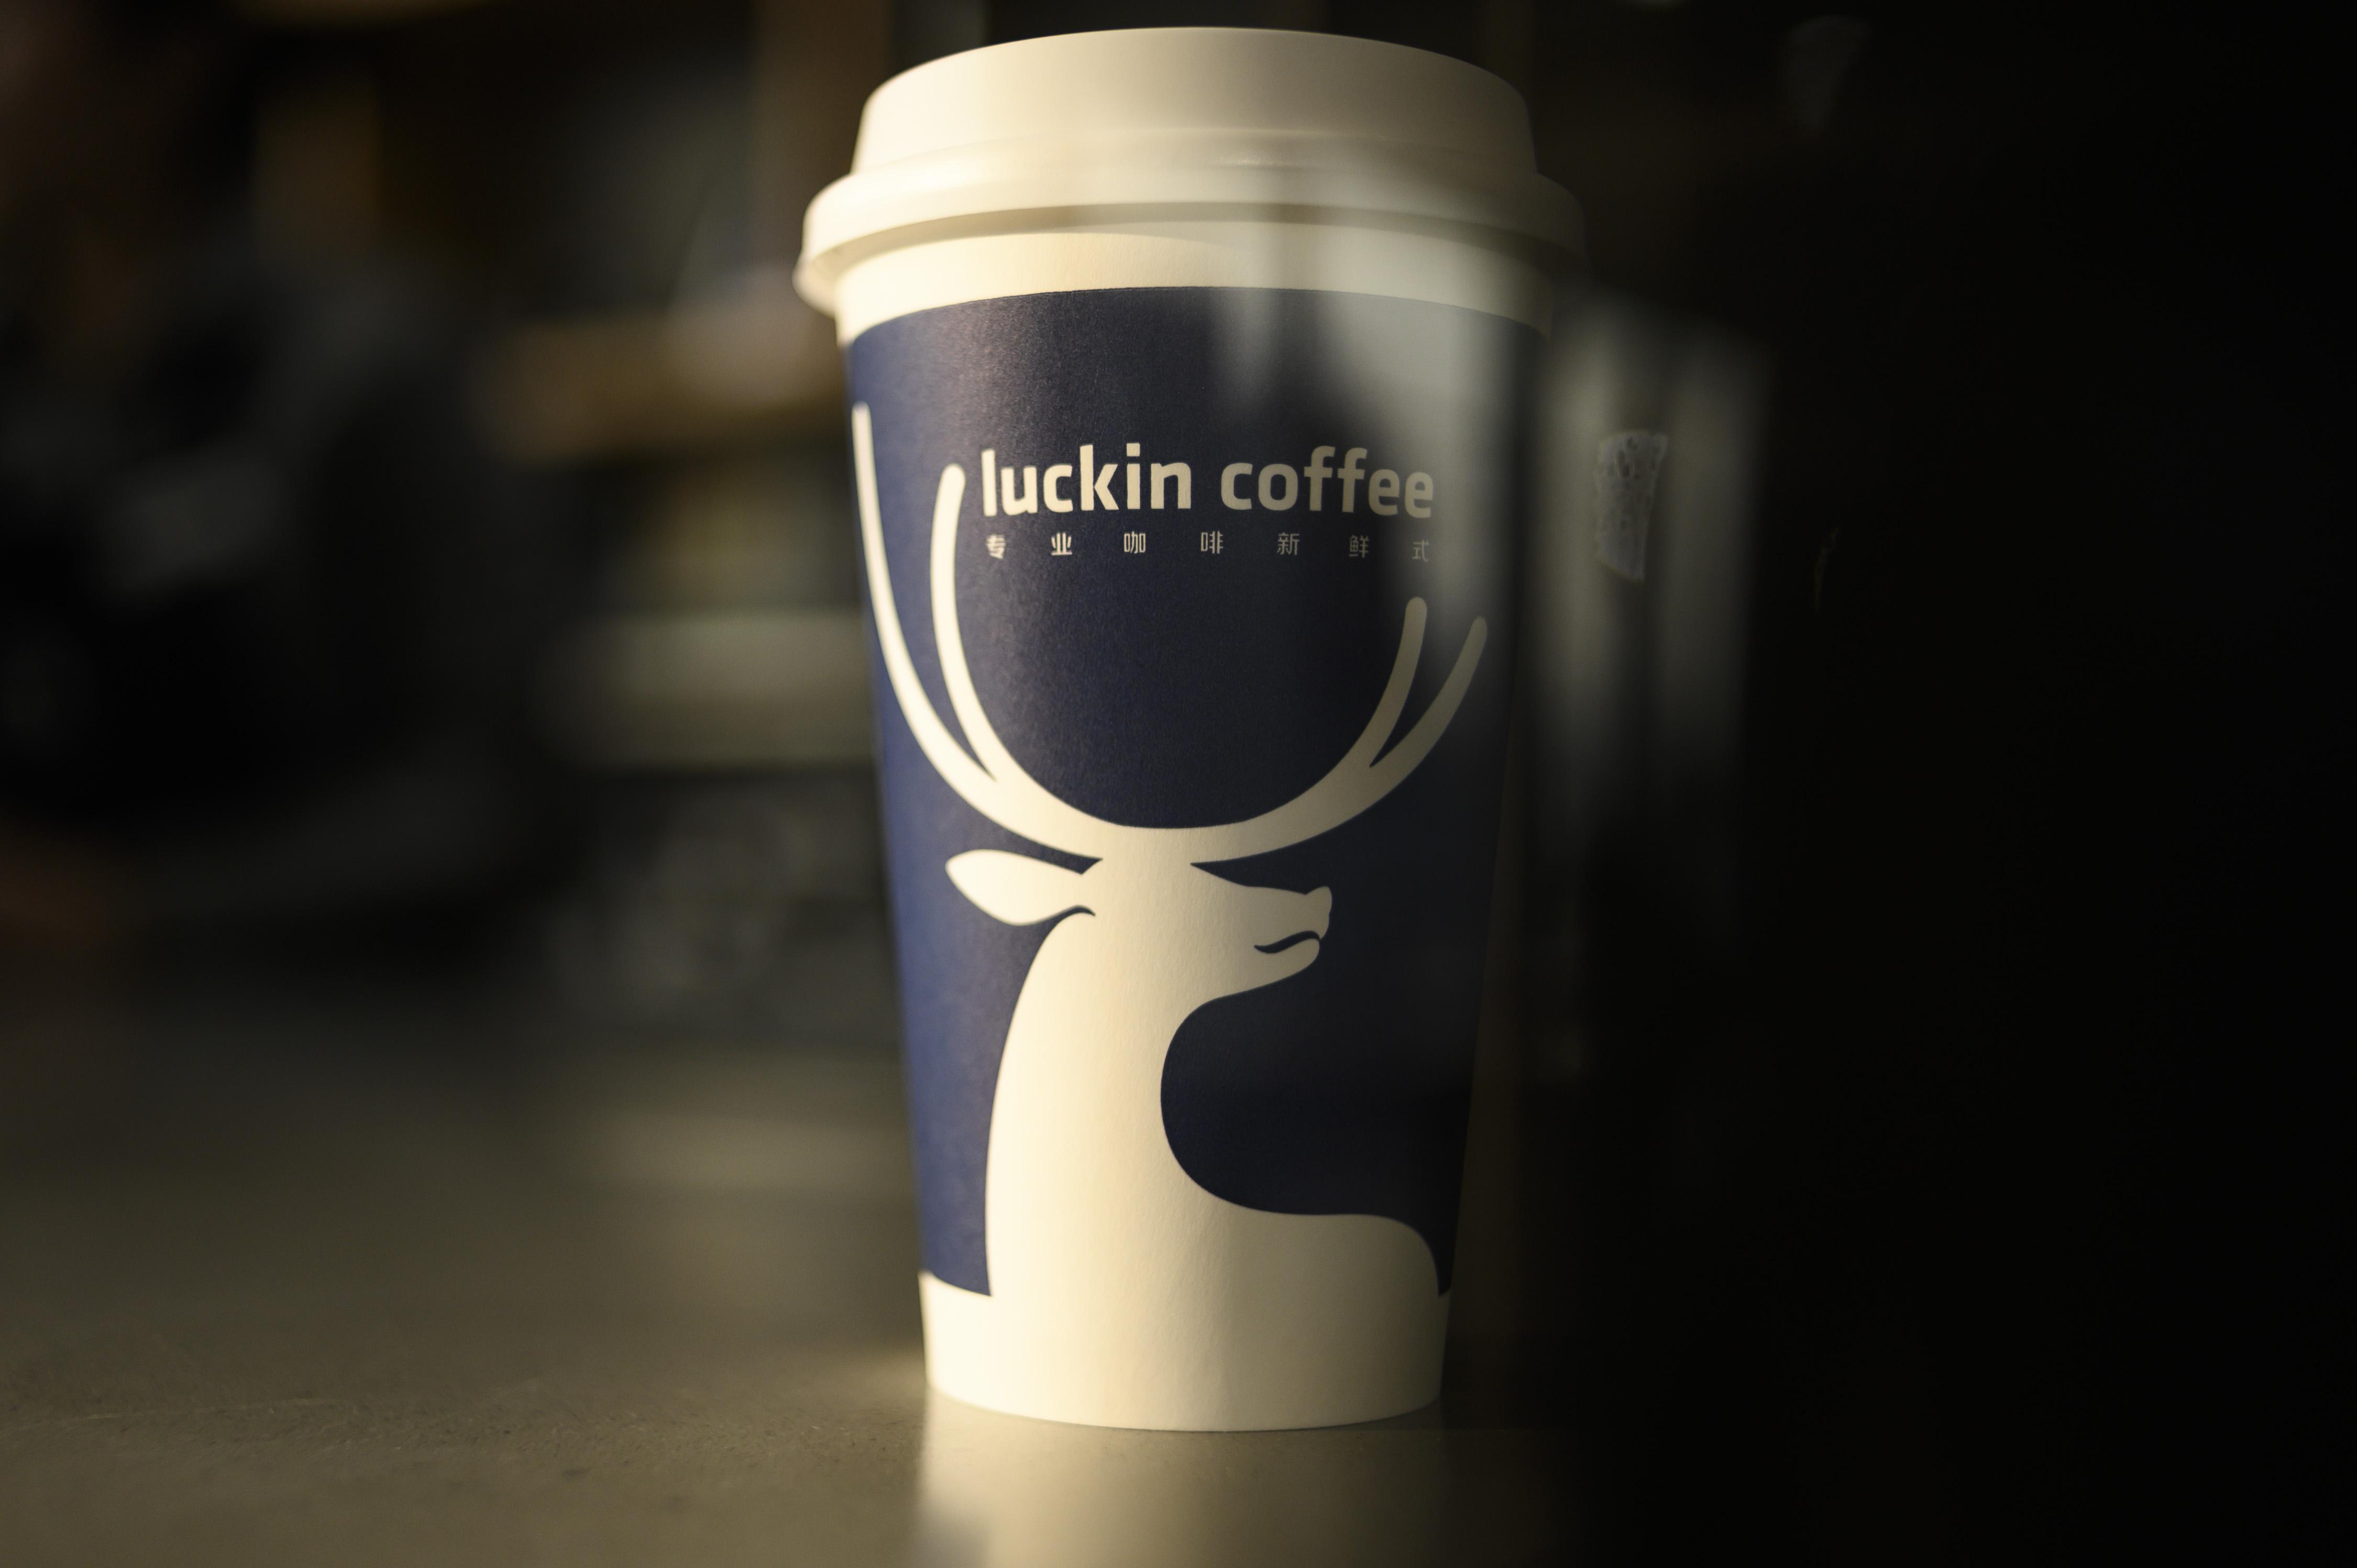 Starbucks Seasonal Drinks Calendar 2022.Coronavirus China S Luckin Won T Fade From Starbucks Battle Bloomberg